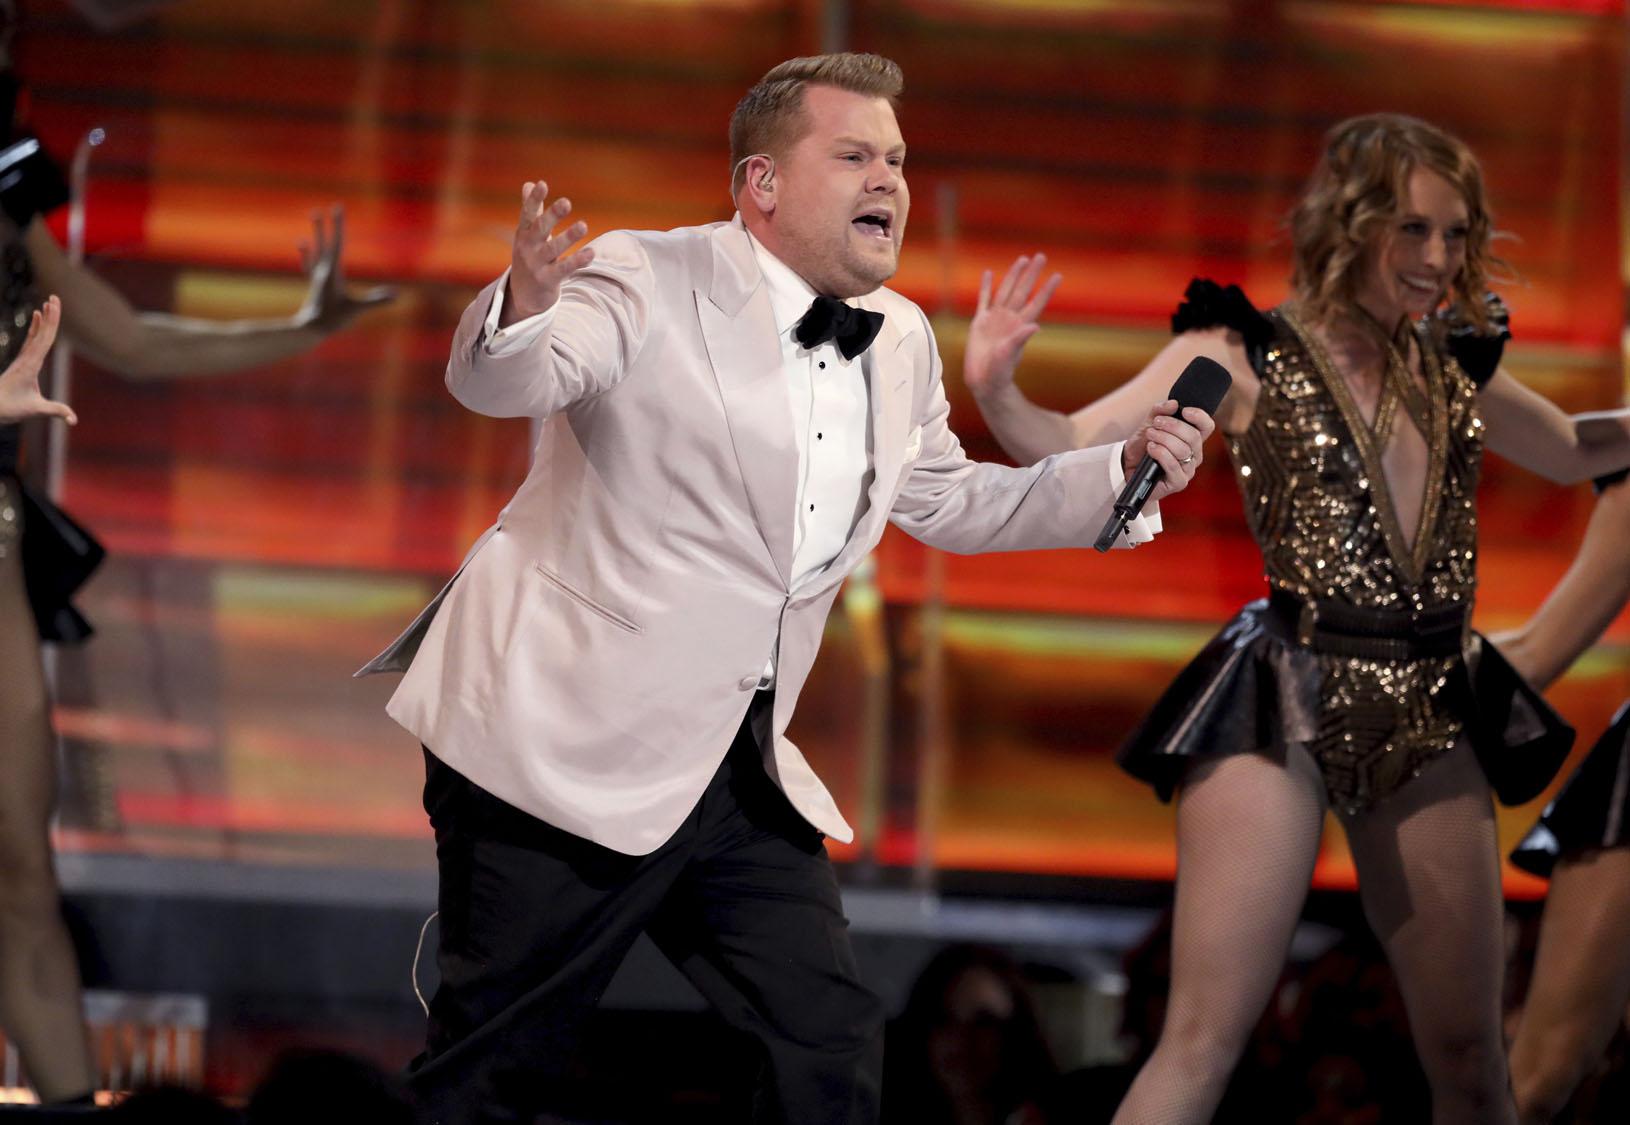 '59th Annual Grammy Awards' (CBS / 4Music) - Edit Producer